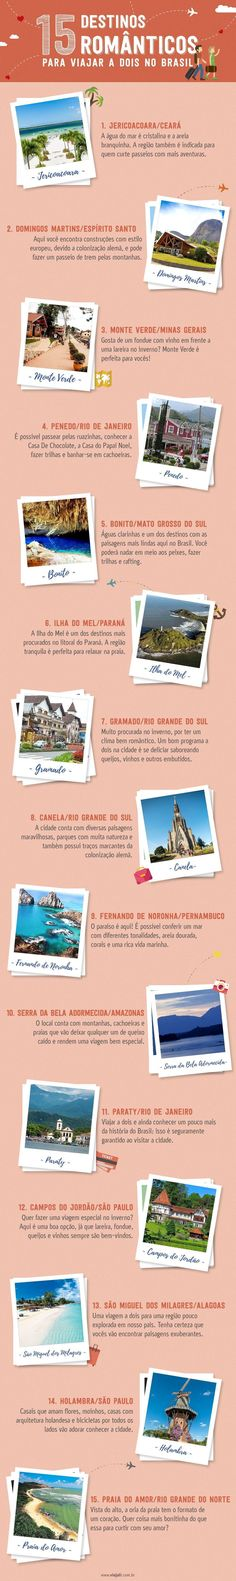 15 destinos românticos para viajar a dois no Brasil